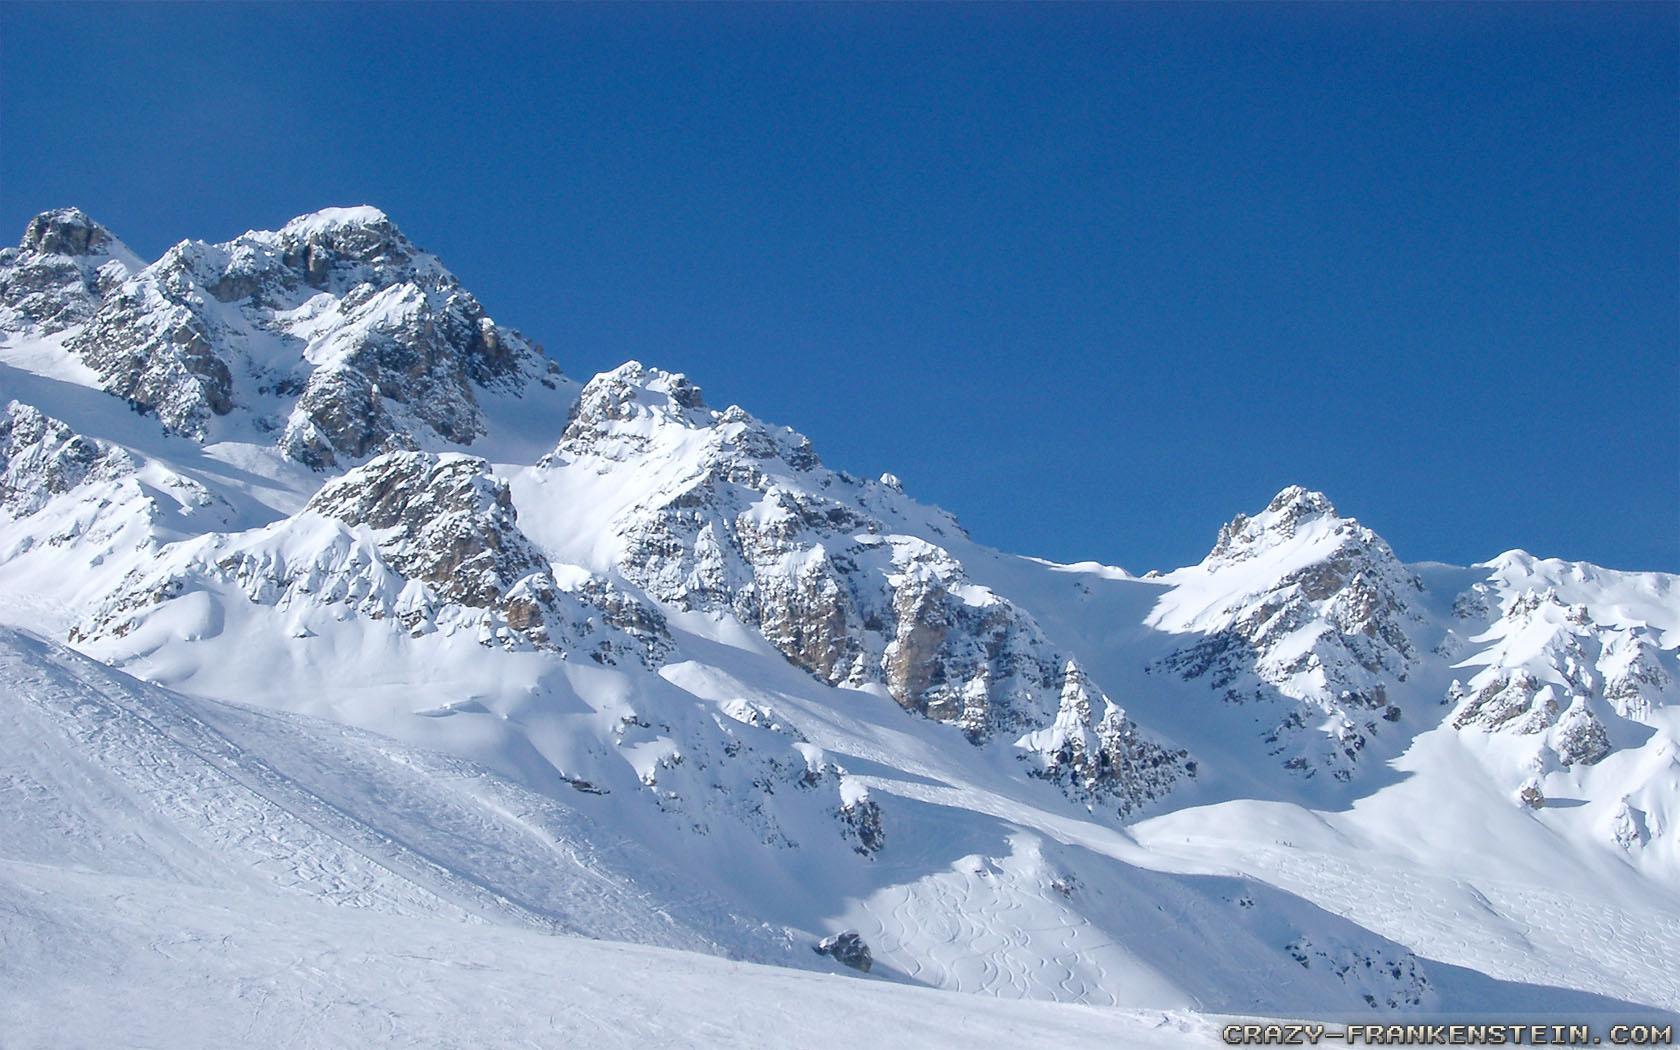 Winter mountain wallpaper wallpapersafari - Wallpaper hd nature winter ...